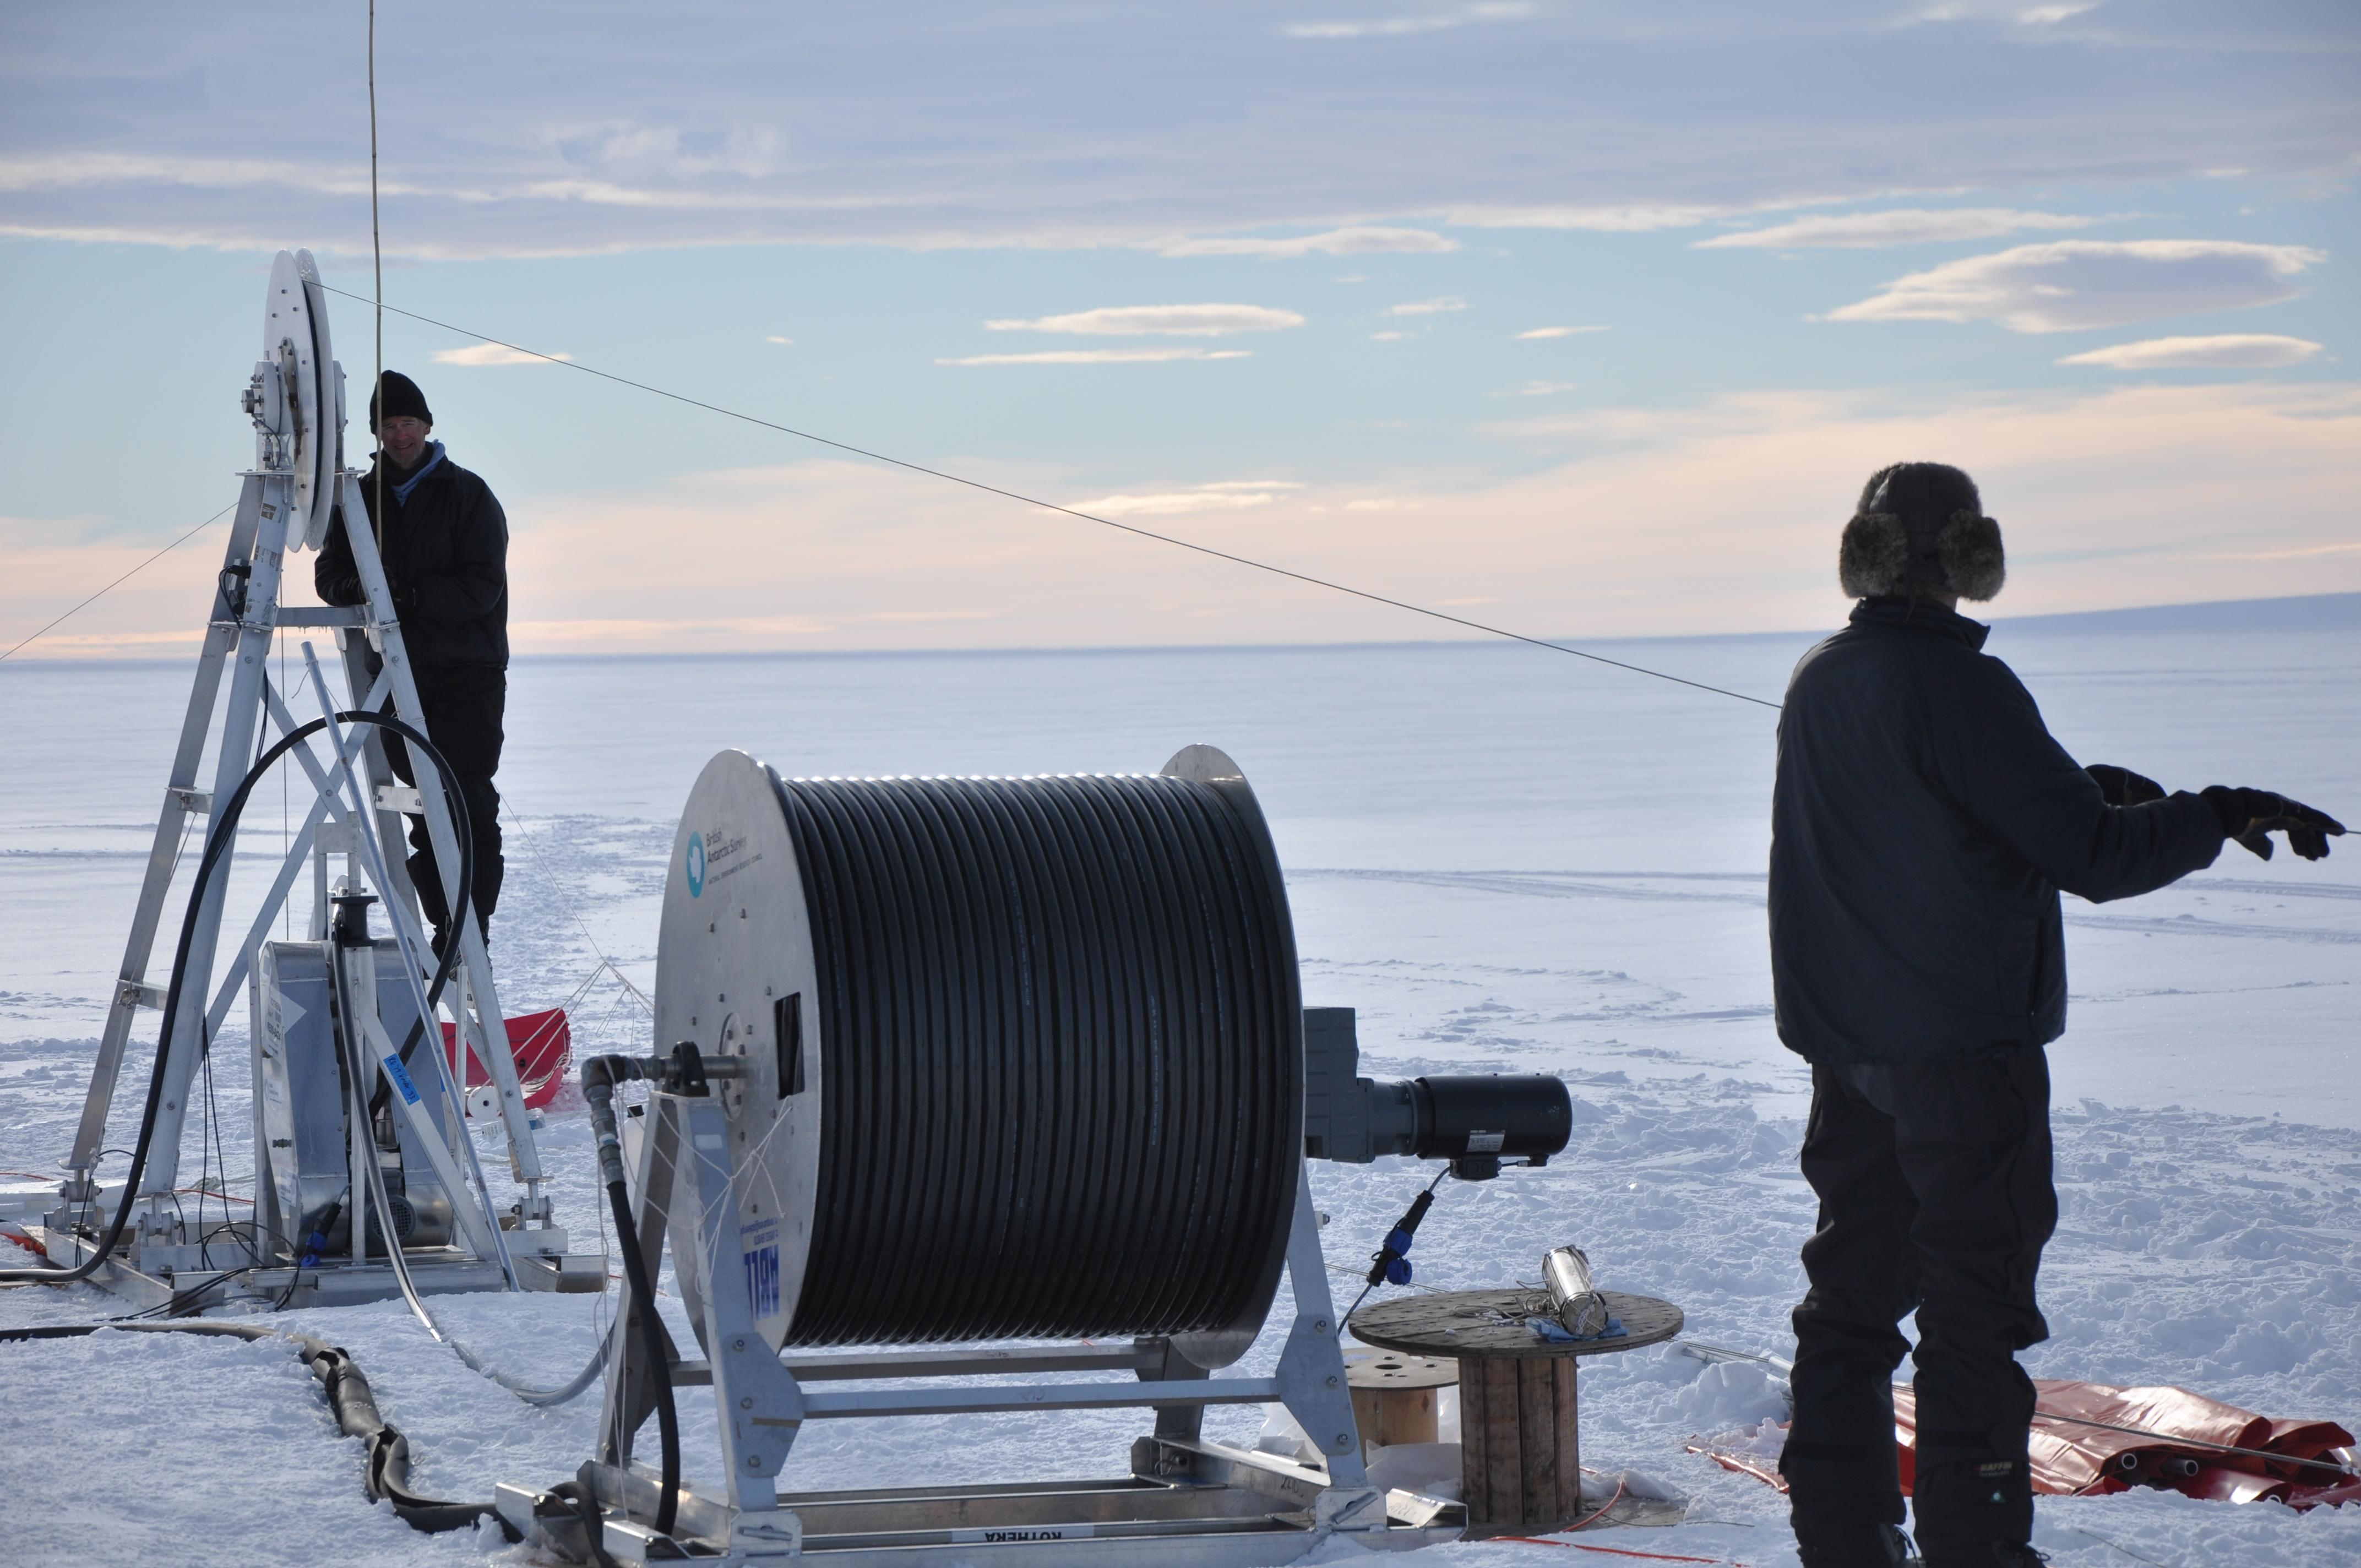 Hot water drilling in Antarctica